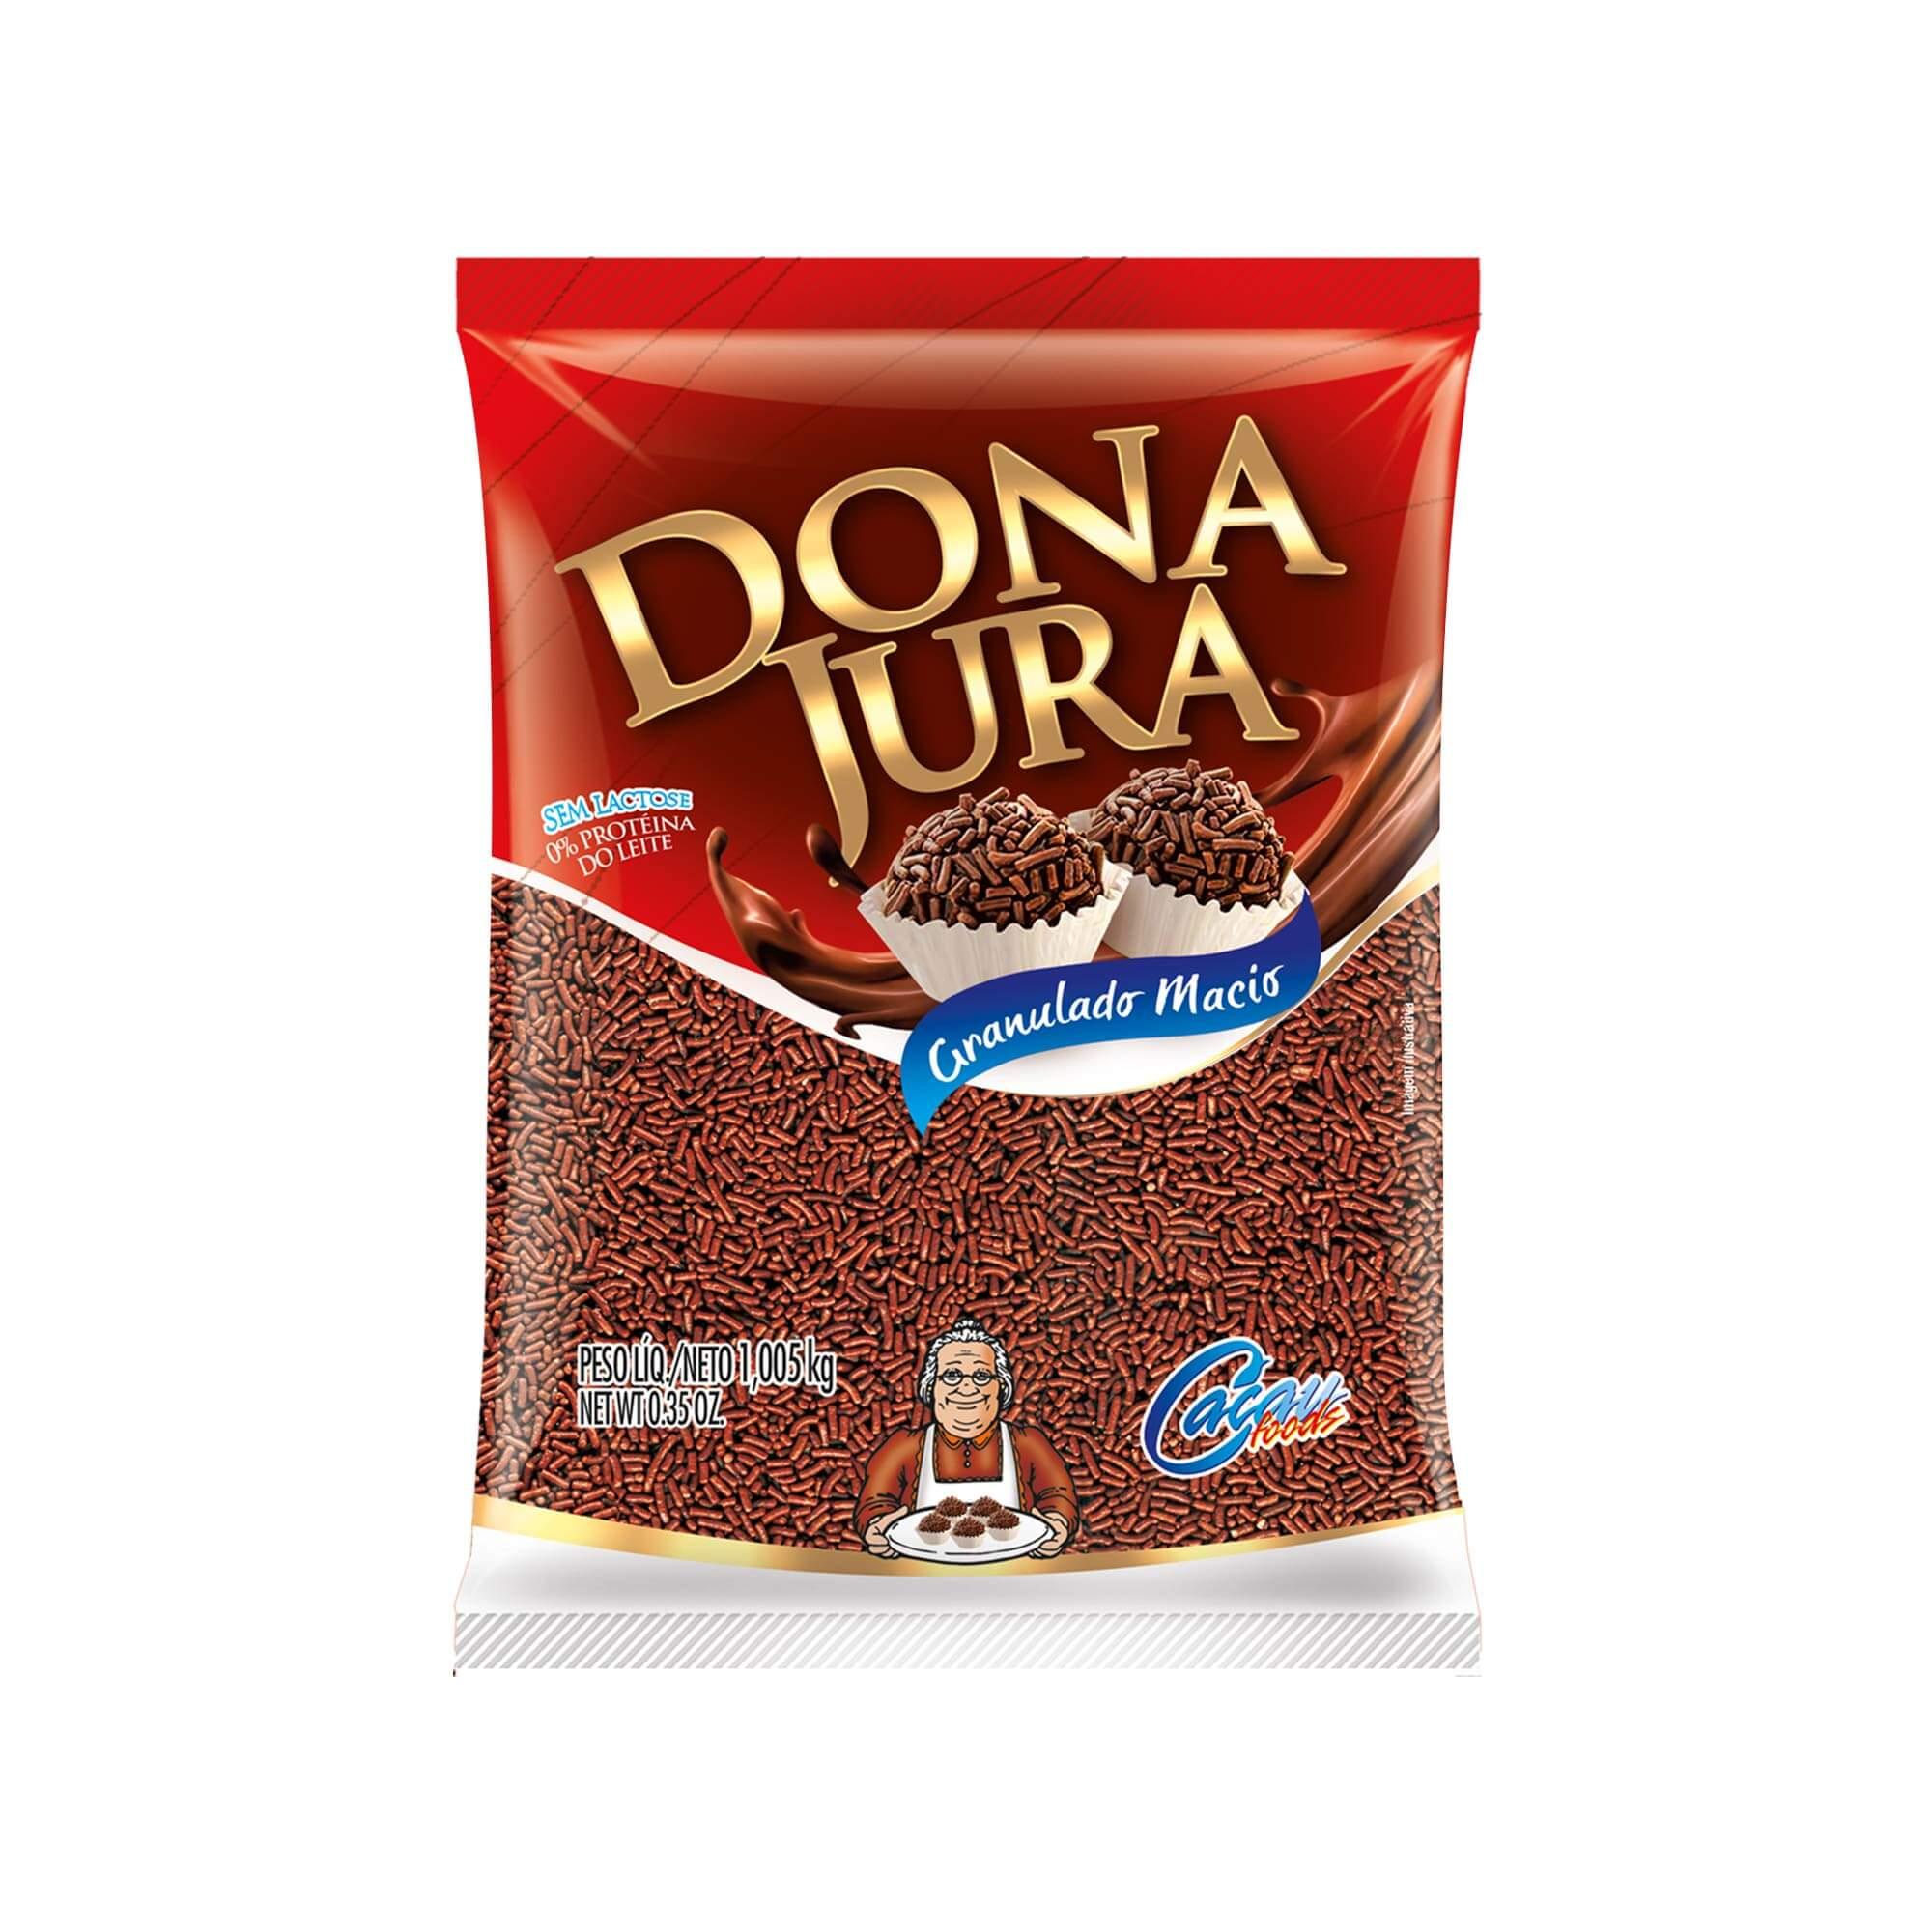 Granulado Macio Dona Jura Sabor Chocolate 1,005Kg